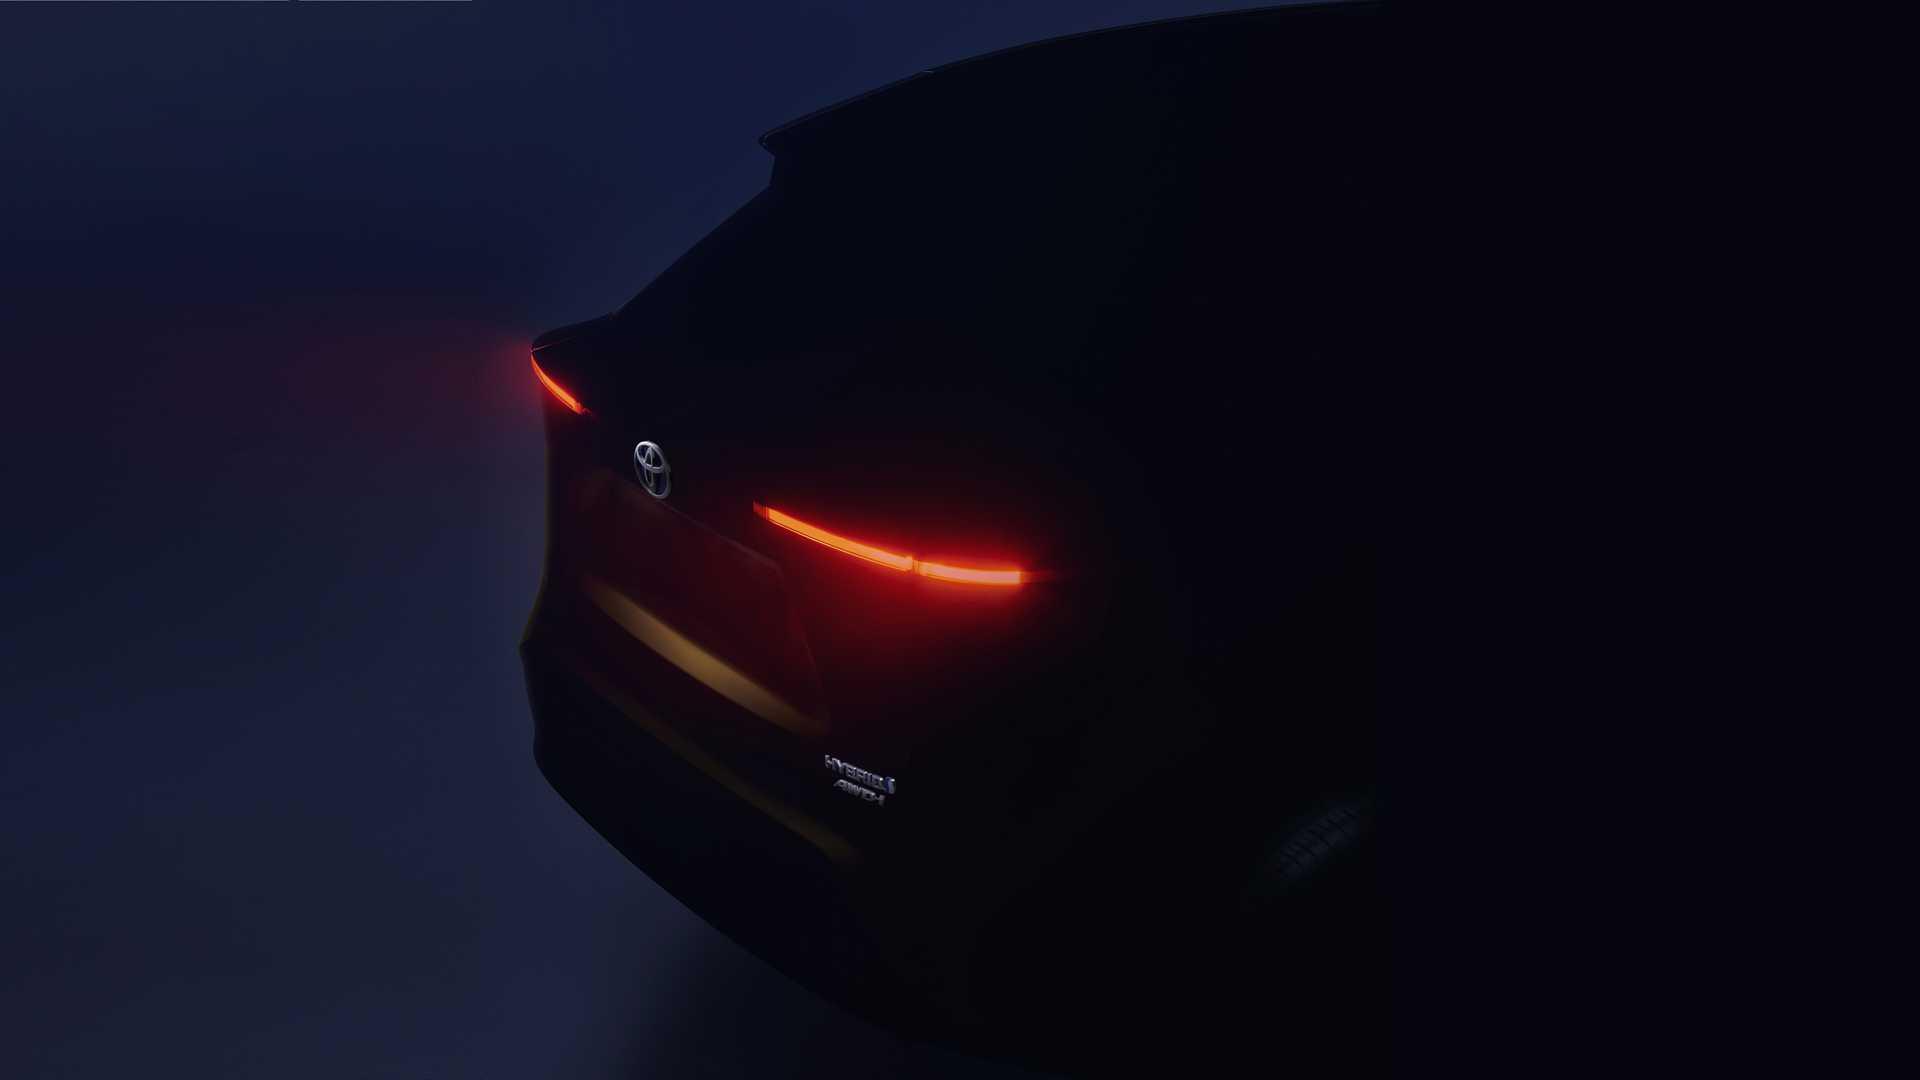 Toyota представит кроссовер на базе хэтчбека Yaris 23 апреля